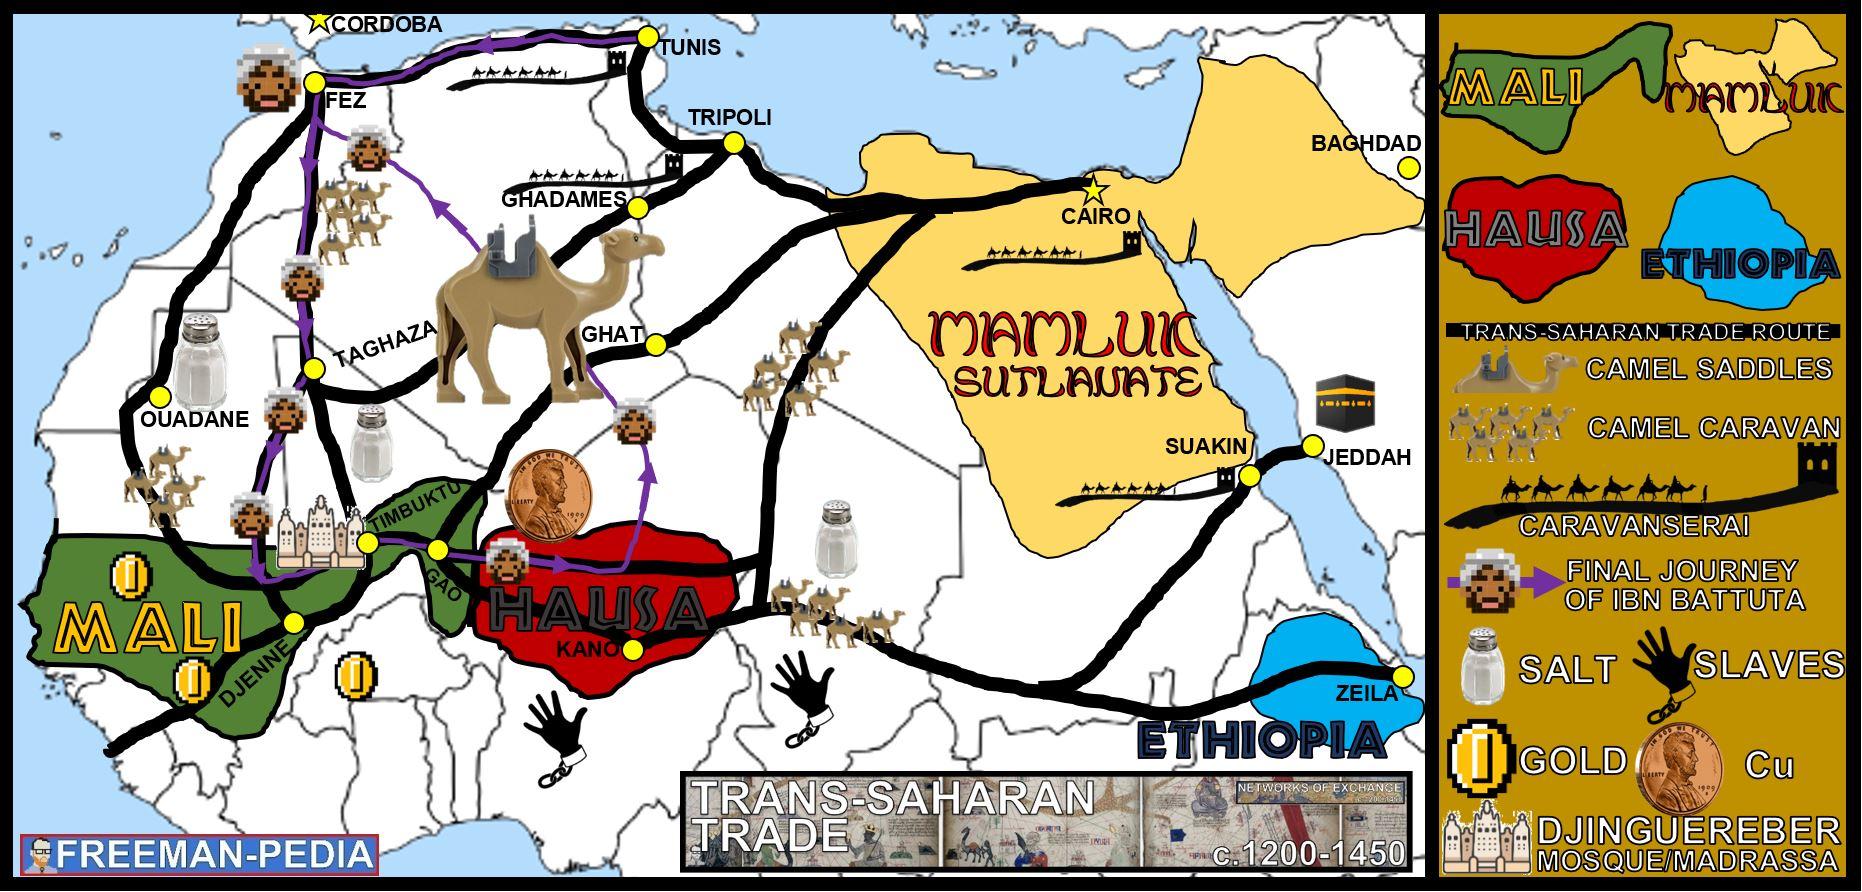 NETWORKS OF EXCHANGE TRANS SAHARAN TRADE 2.4 MAP AP WORLD HISTORY FREEMANPEDIA.JPG